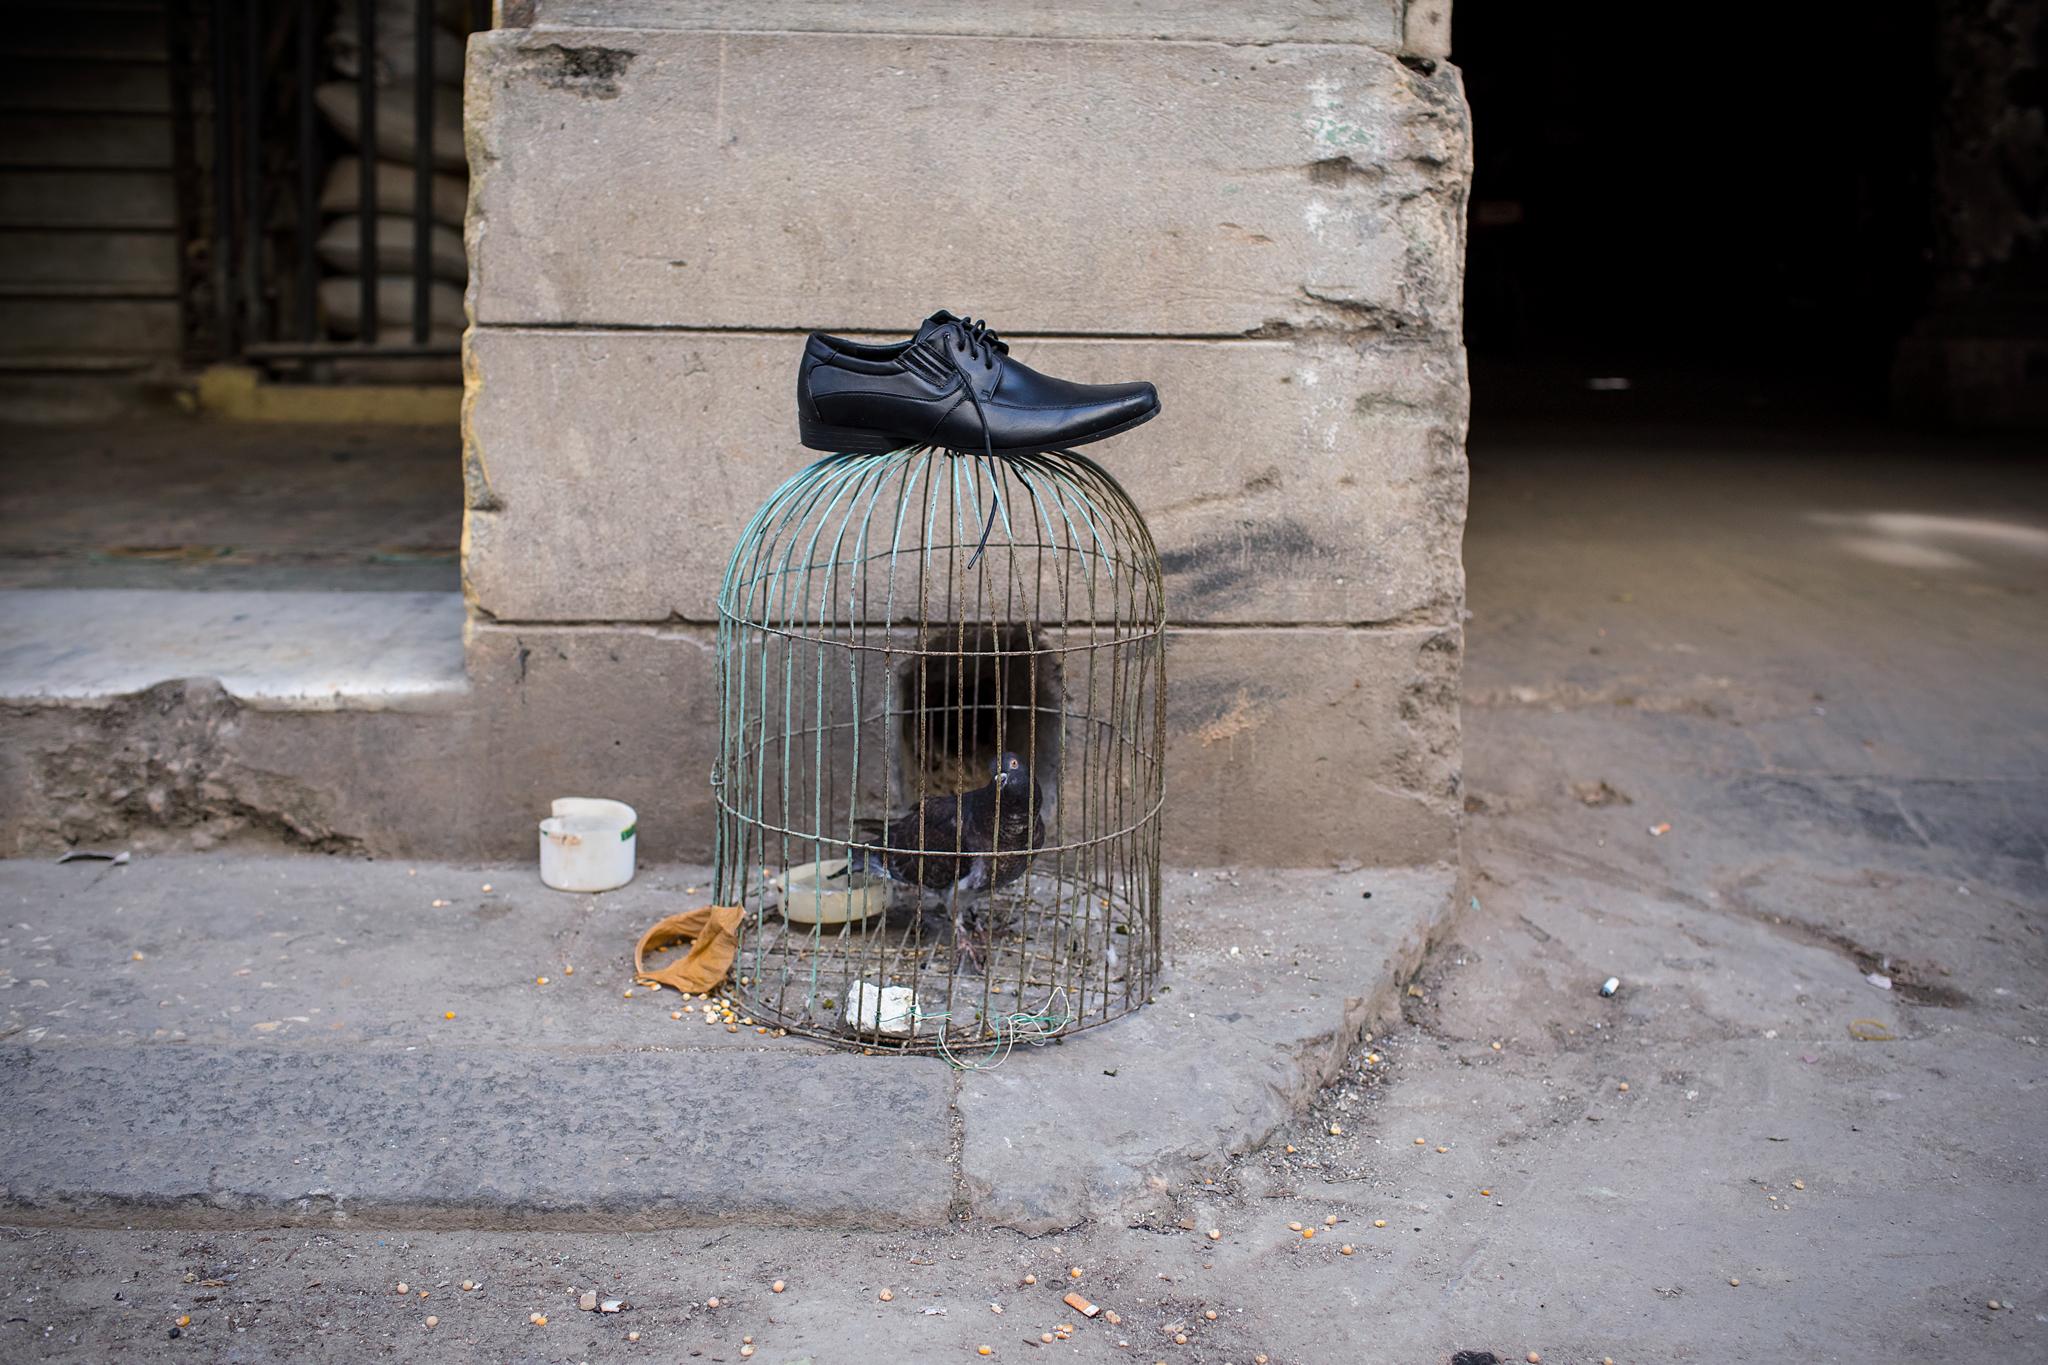 fb.cc.3.29.2017.Birdcage_W_Shoe_Havana_Cuba_K9A5995.jpg